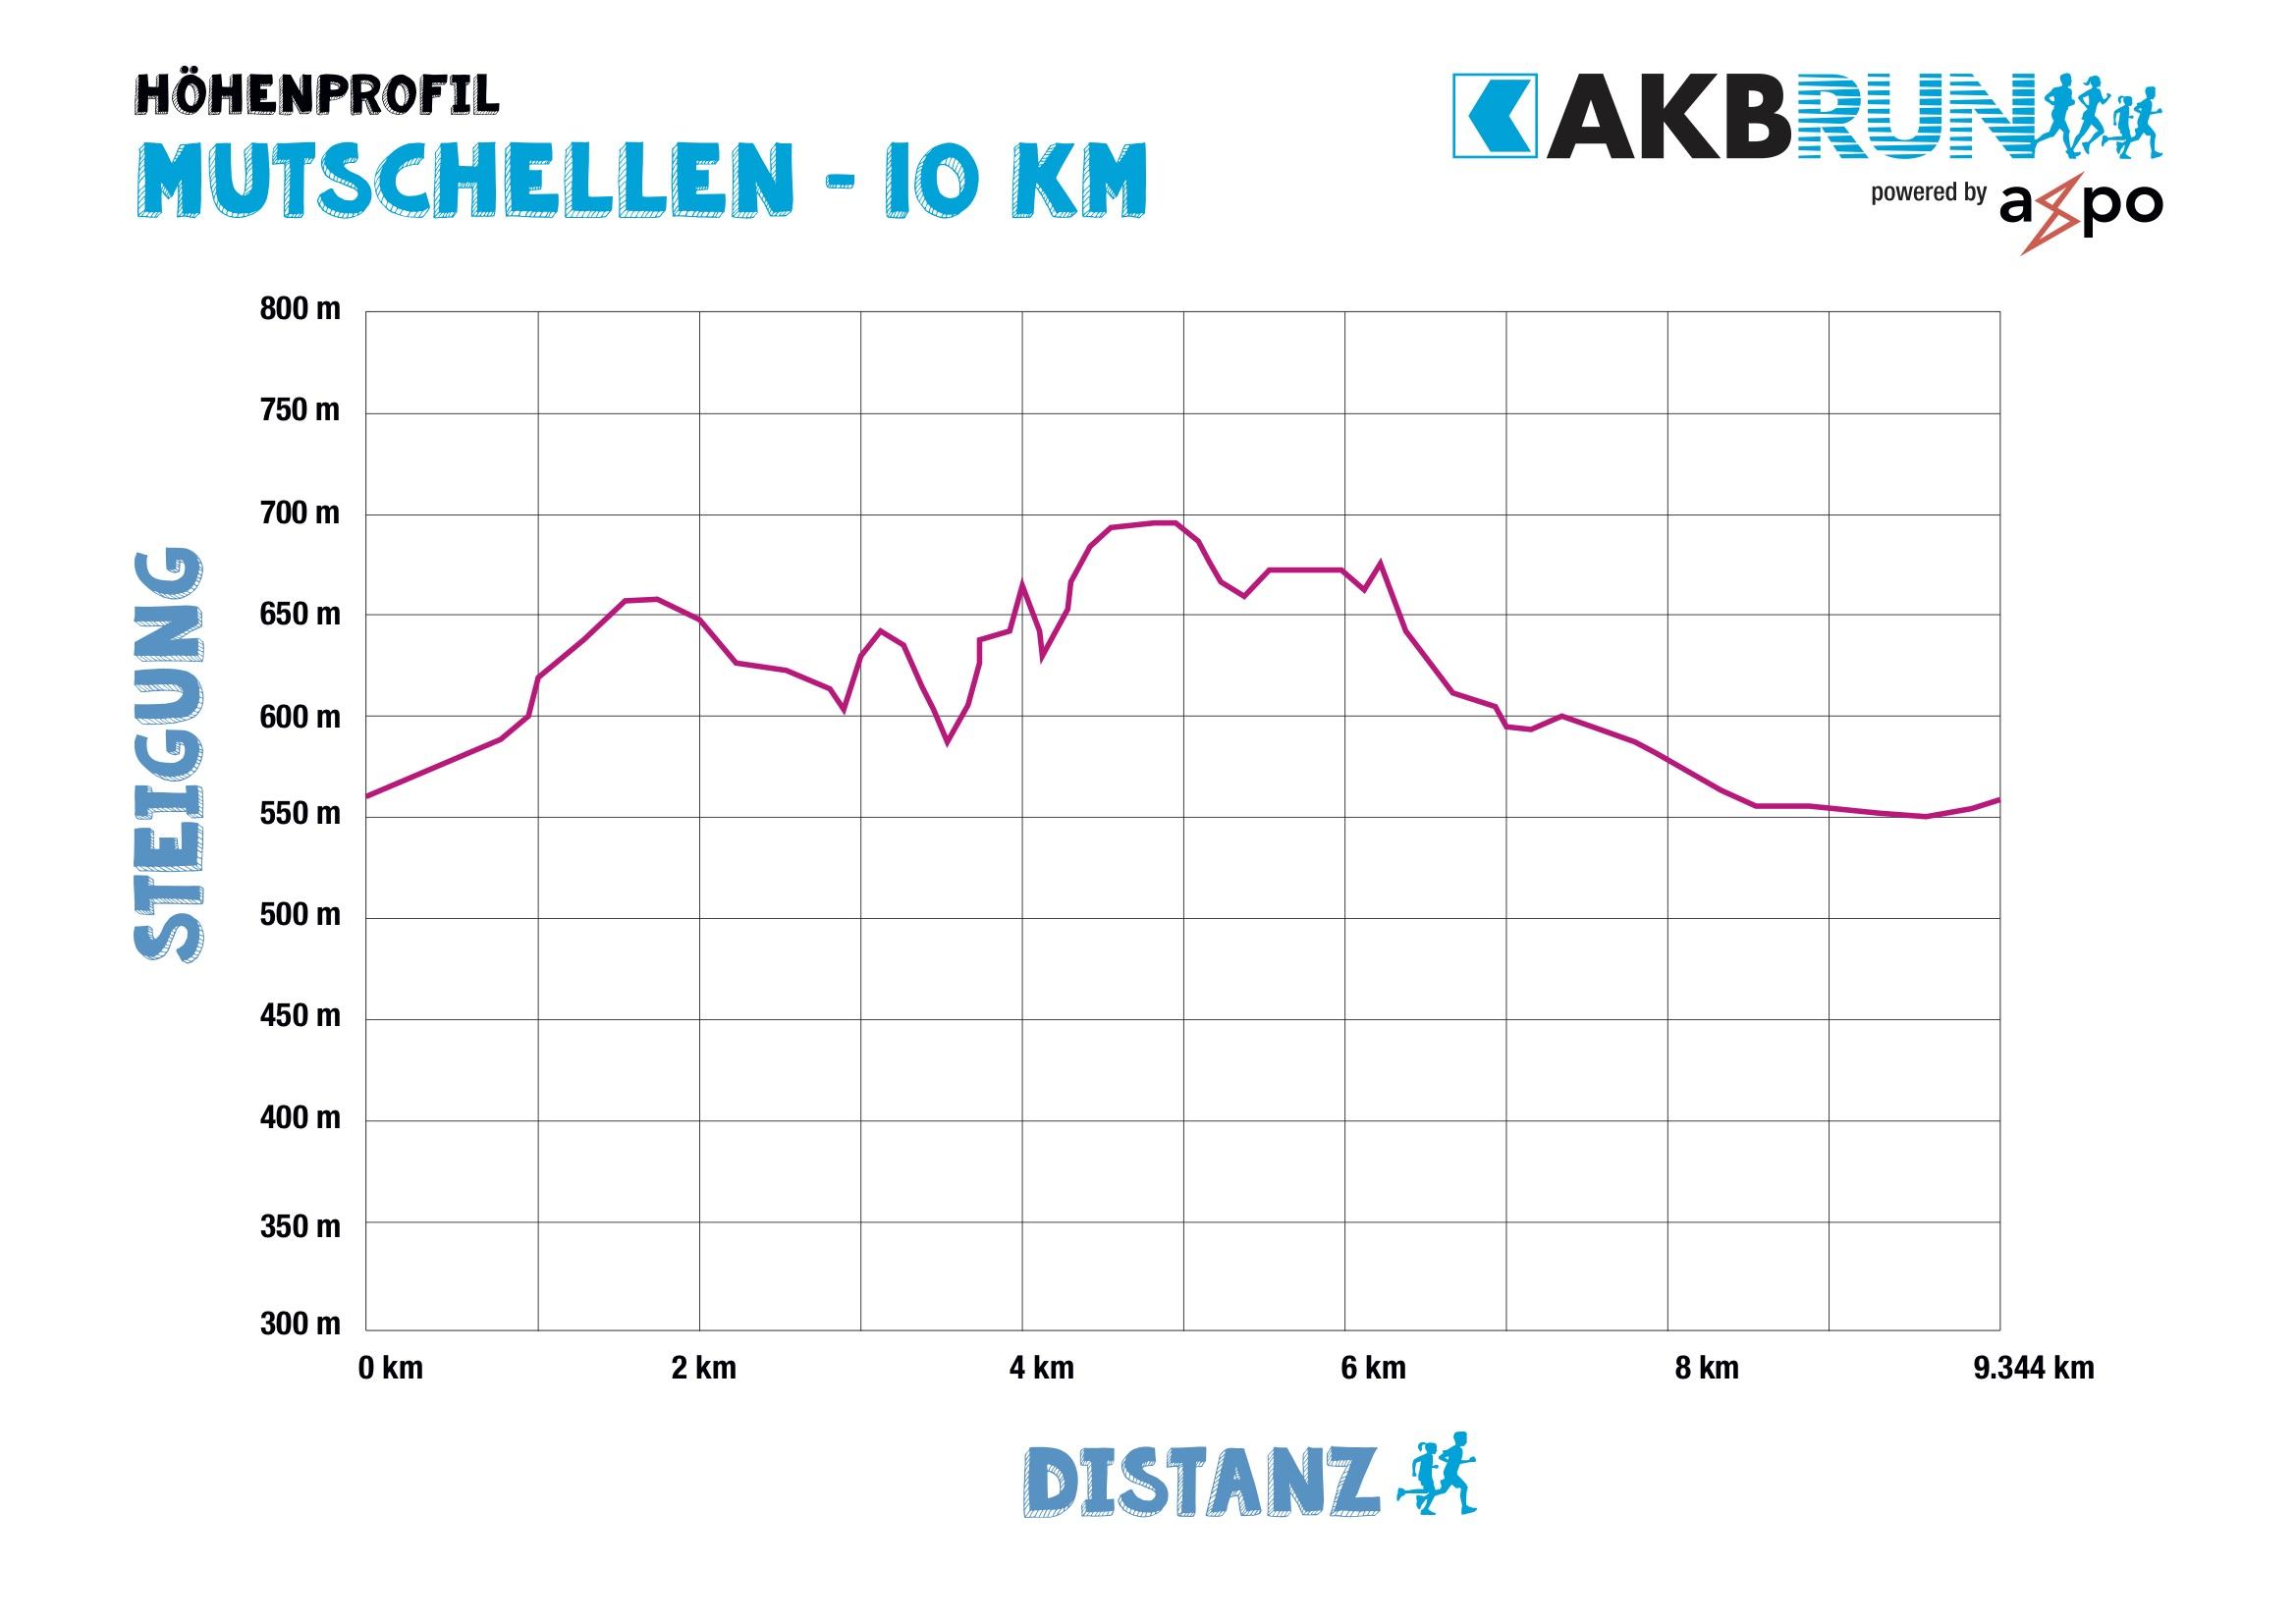 AKB_Run_Hoehenprofile_Mutschellen_10km Kopie.jpg